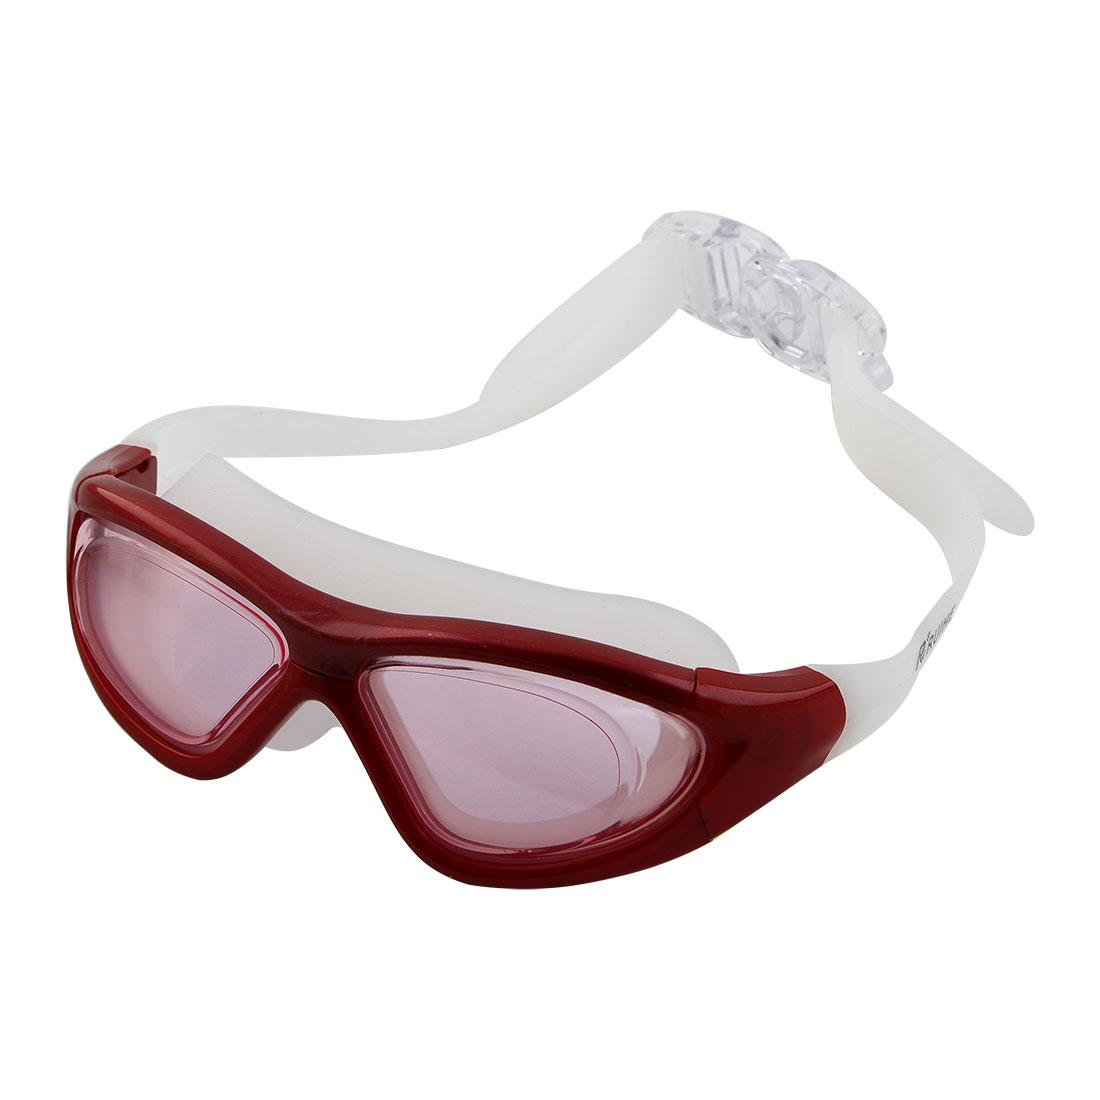 Clear Wide Vision Anti Fog Adjustable Belt Swim Glasses Swimming Goggles Pink w Storage Case for Adult Men Women